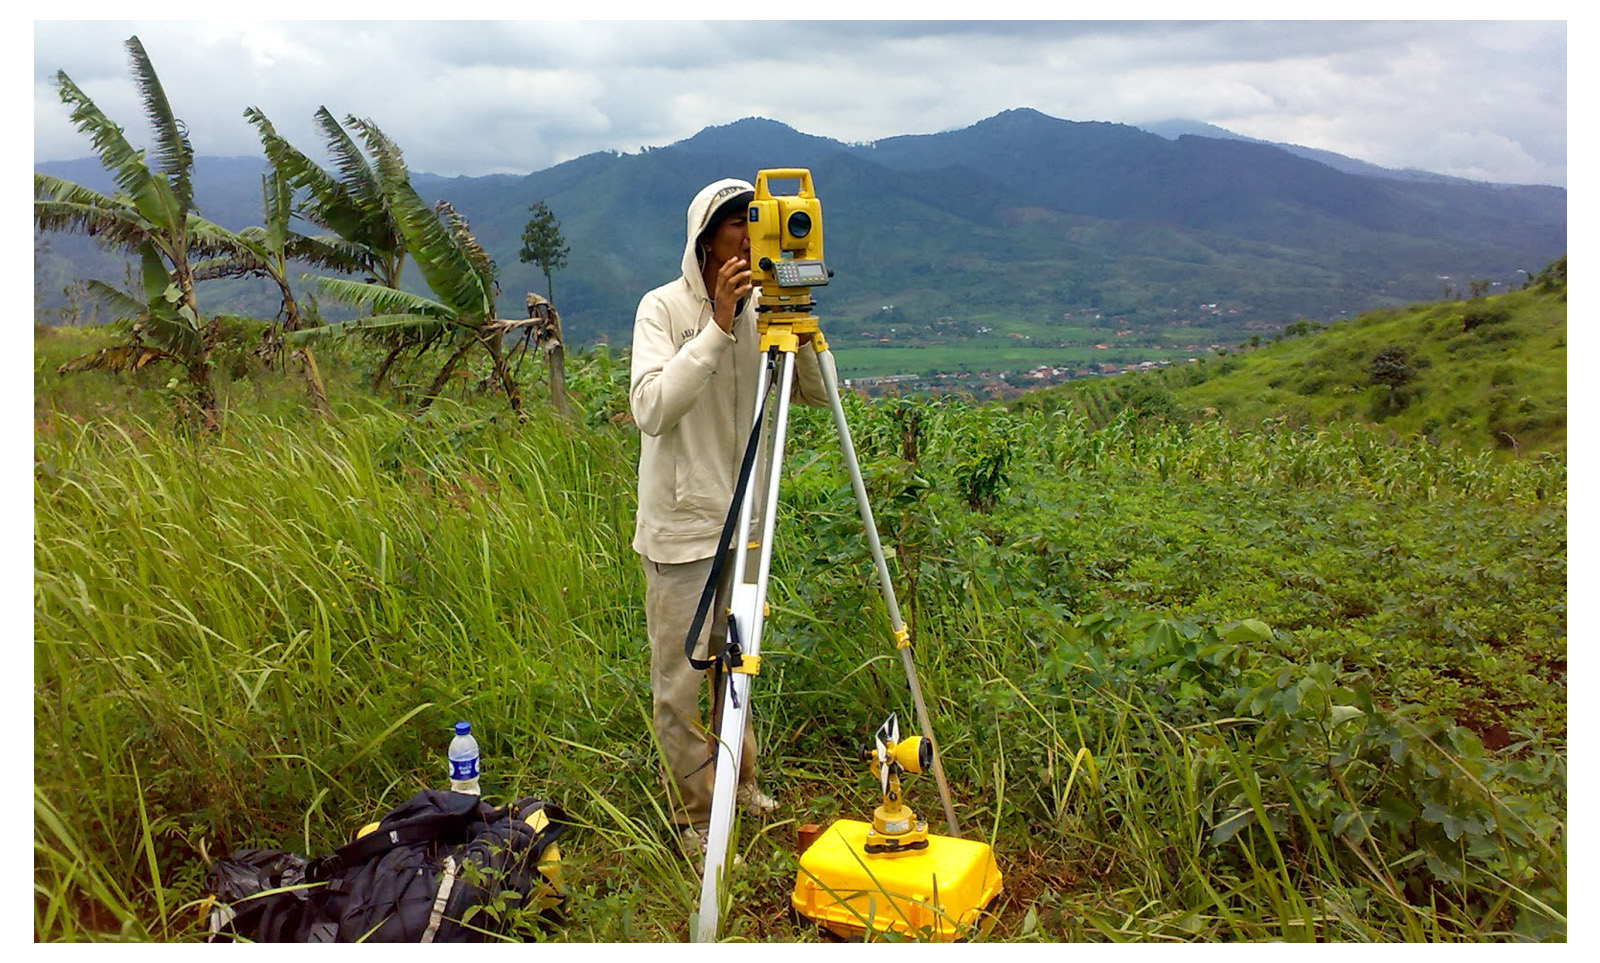 Jasa Pemetaan / Pengukuran Tanah & Topografi di Palu